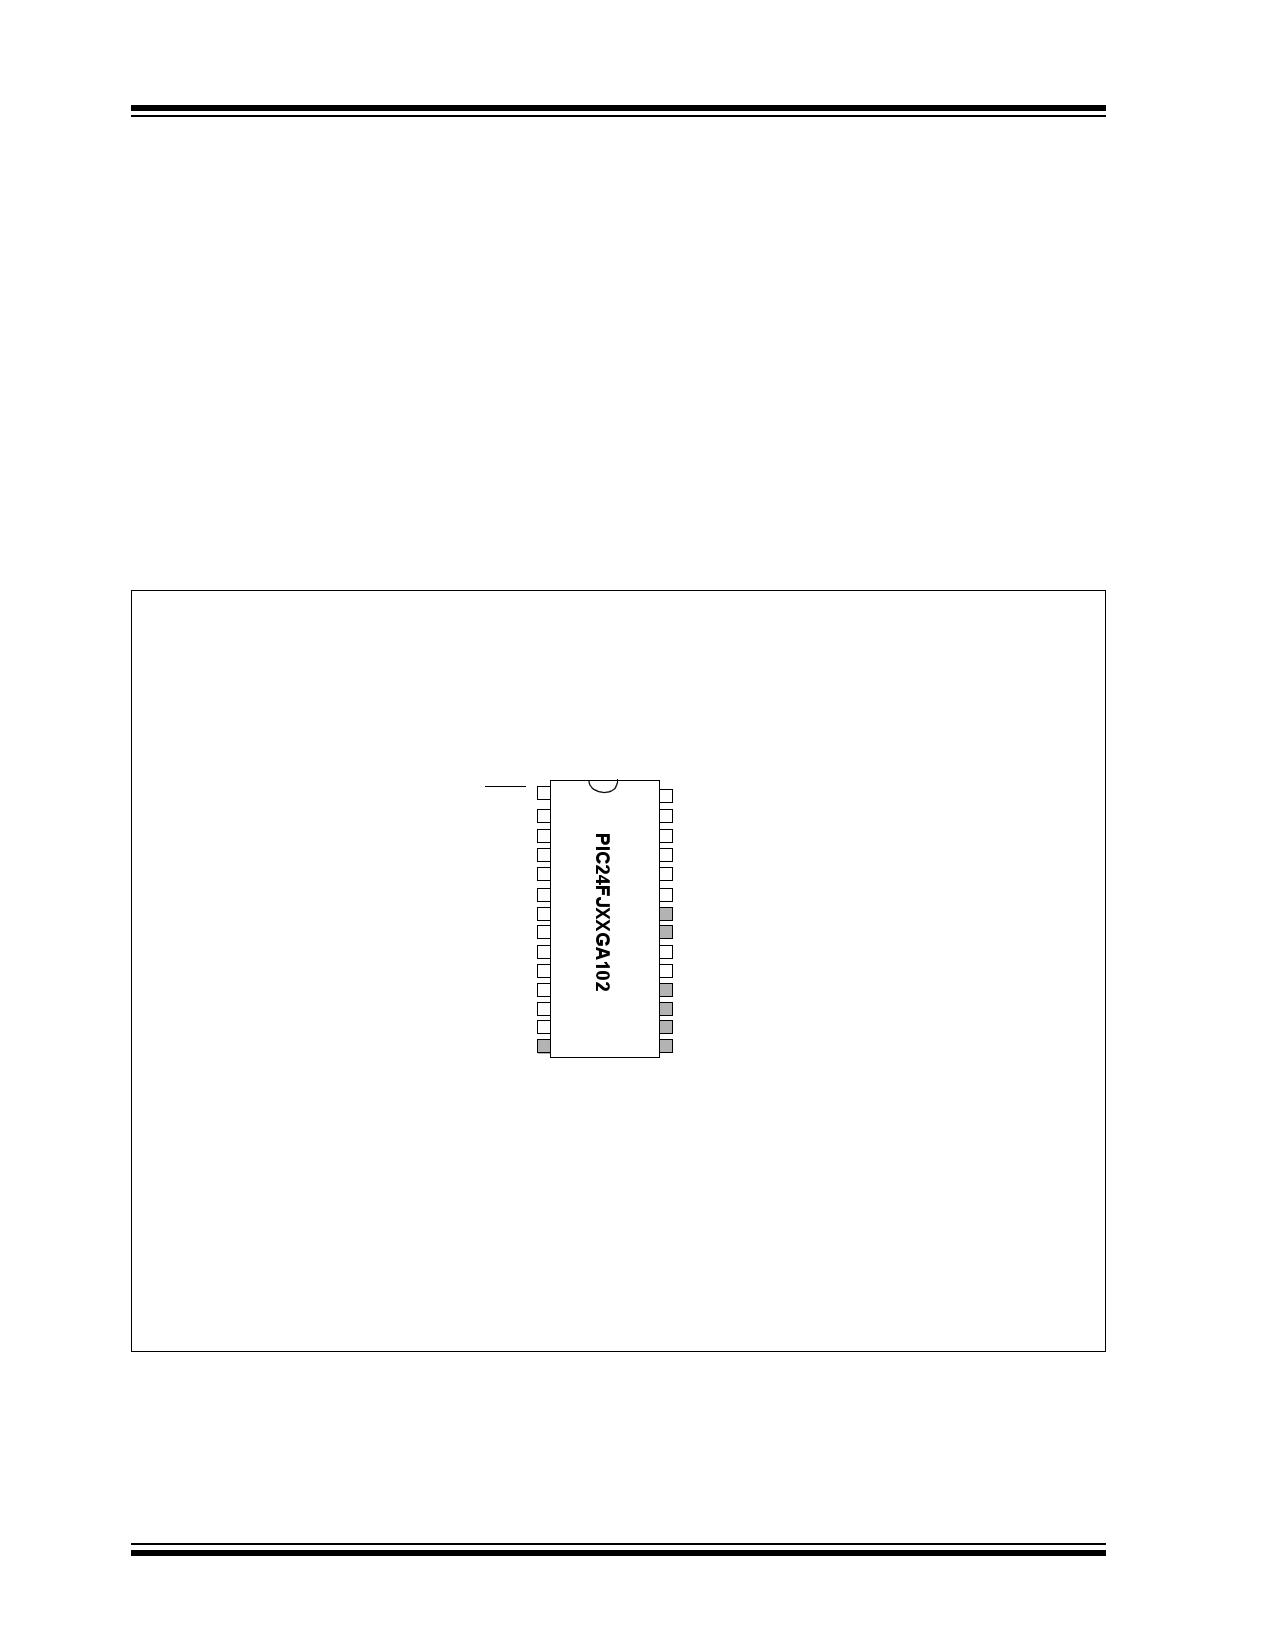 PIC24FJ32GA104 pdf, 반도체, 판매, 대치품